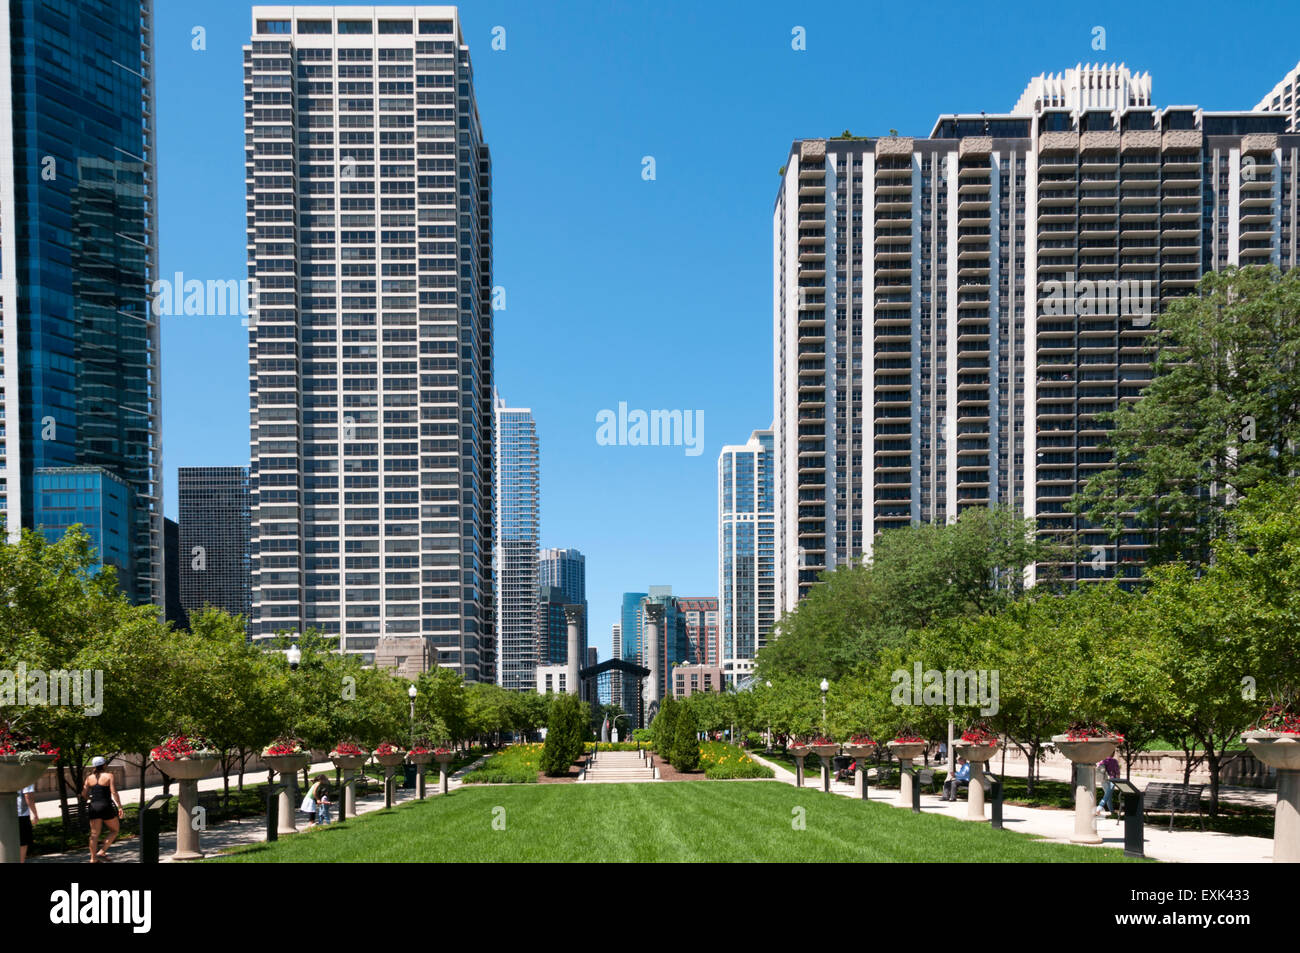 The Richard & Annette Bloch Cancer Survivors' Garden in Grant Park, Chicago. - Stock Image